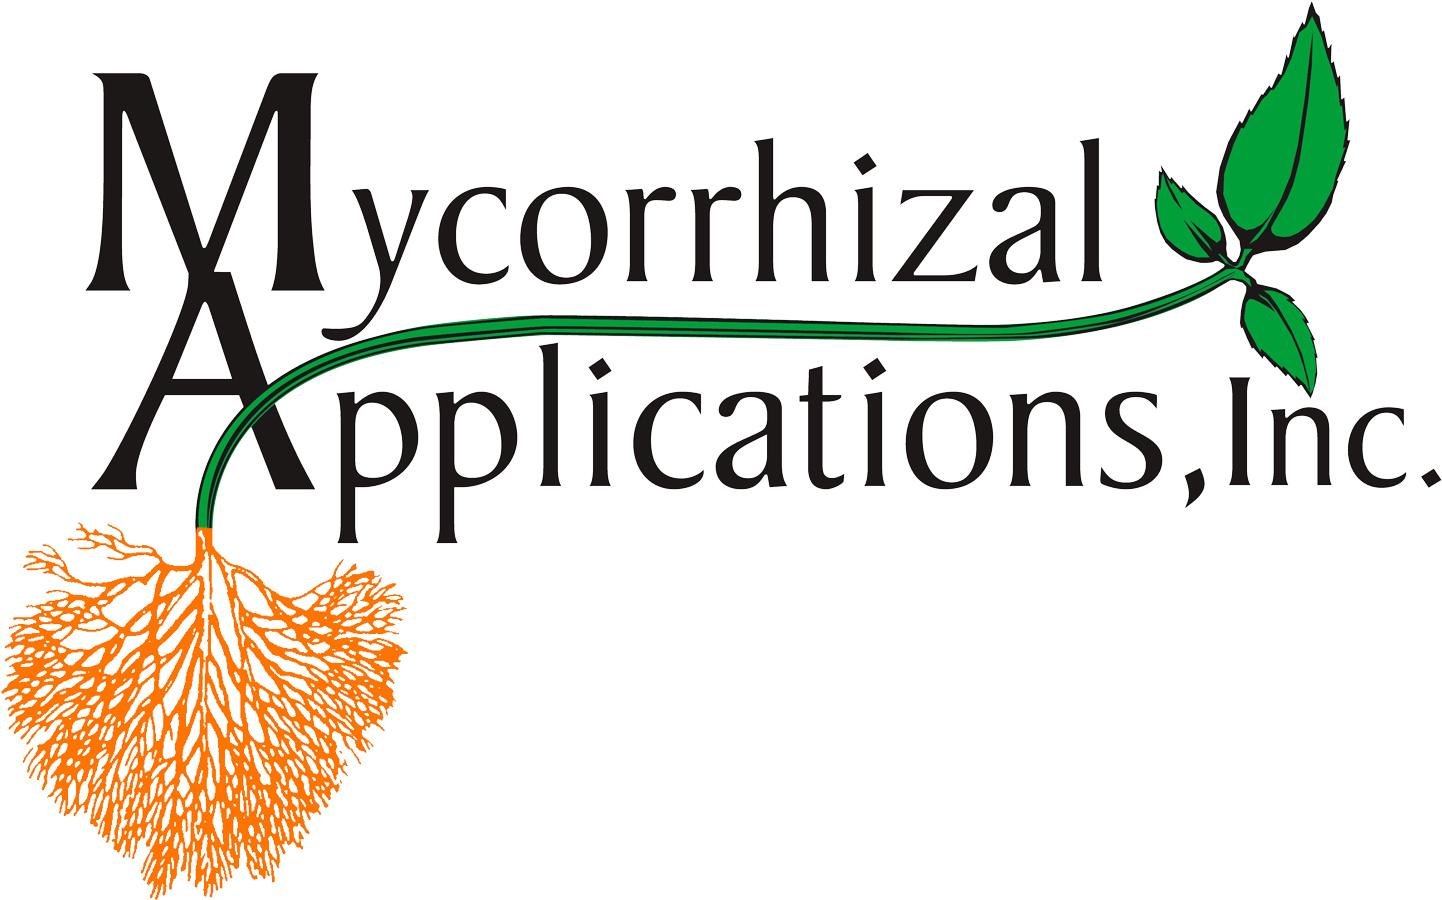 Mycorrhizal_Applications_Inc_logo.jpg